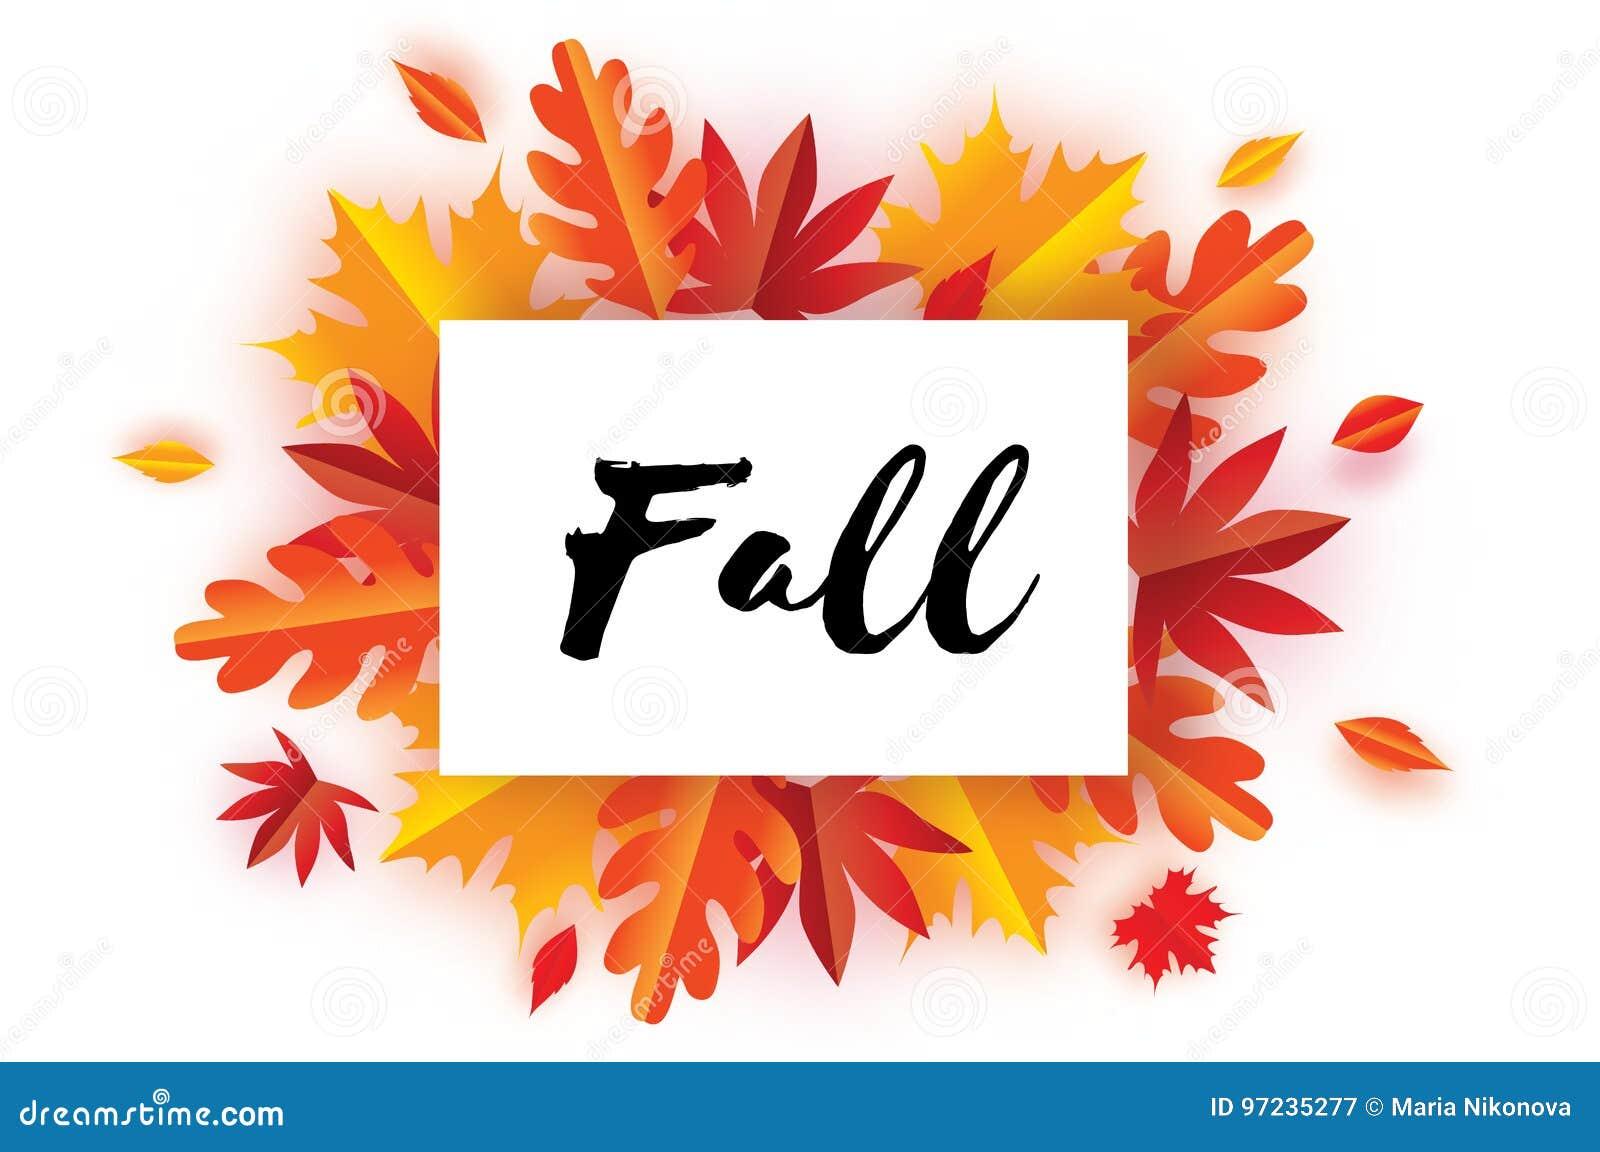 Schöner Autumn Fall Paper Cut Leaves Hallo Herbst September ...